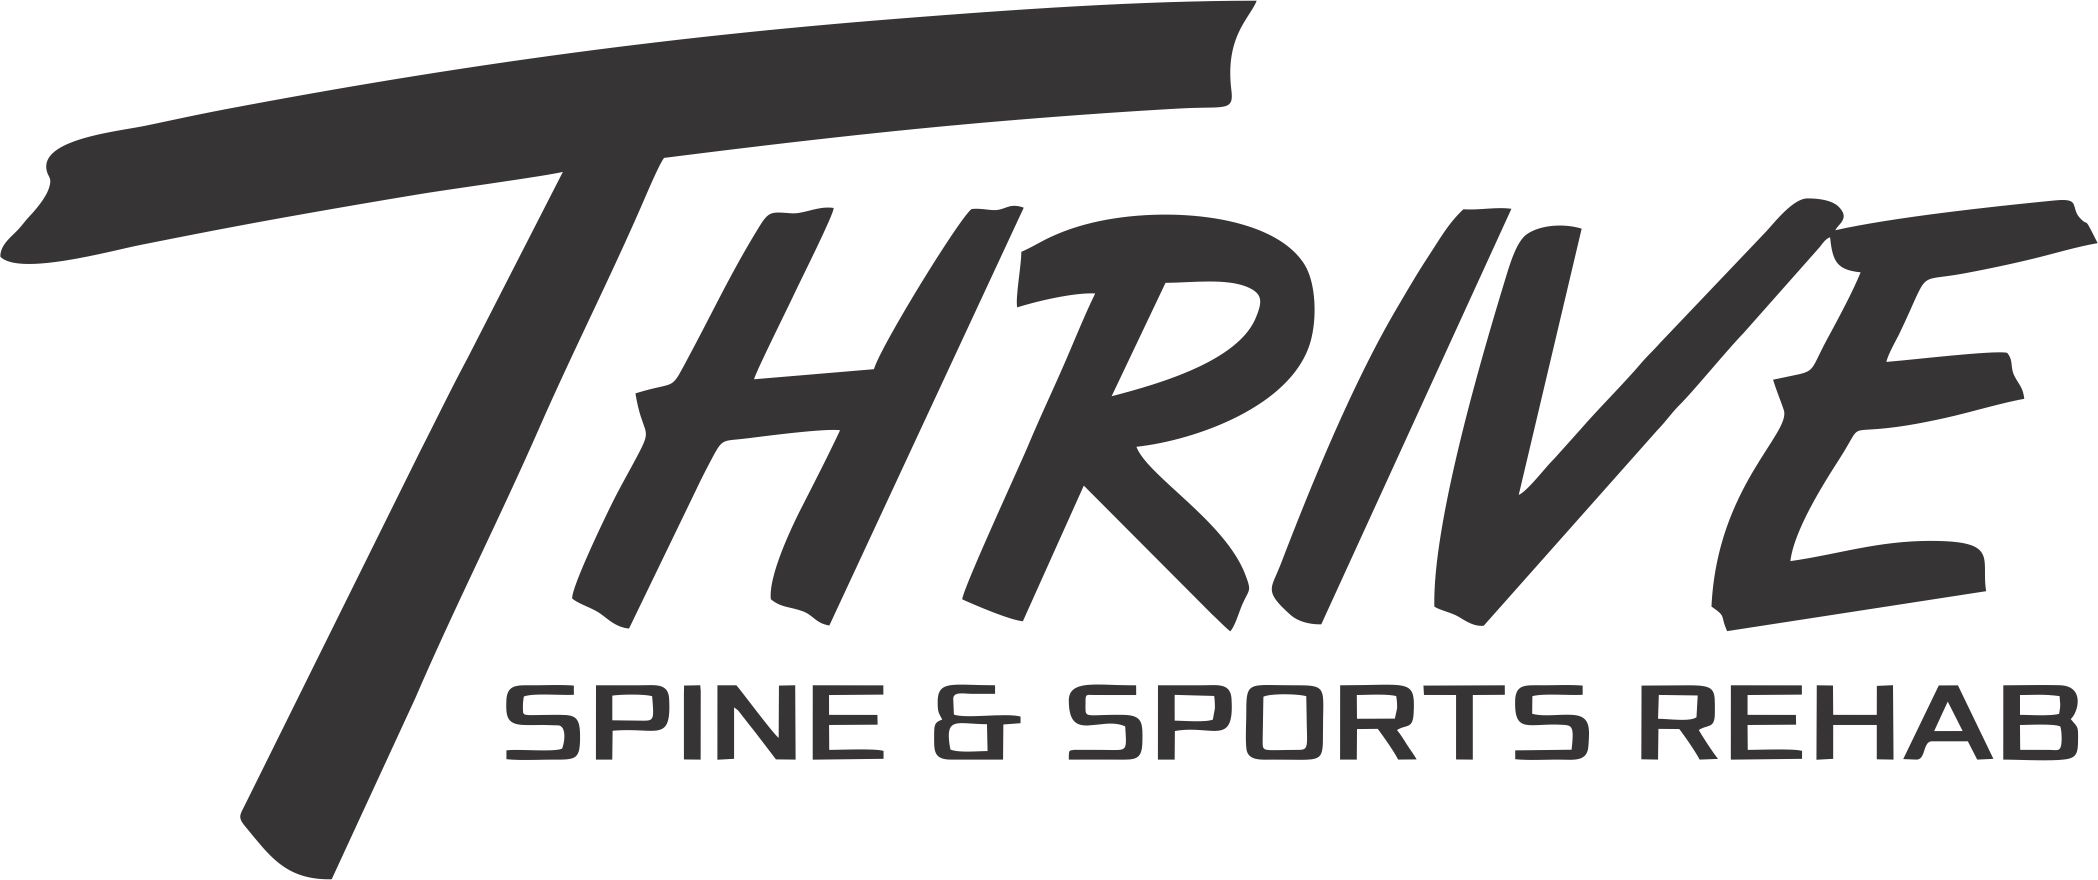 Thrive Spine Logo.jpg